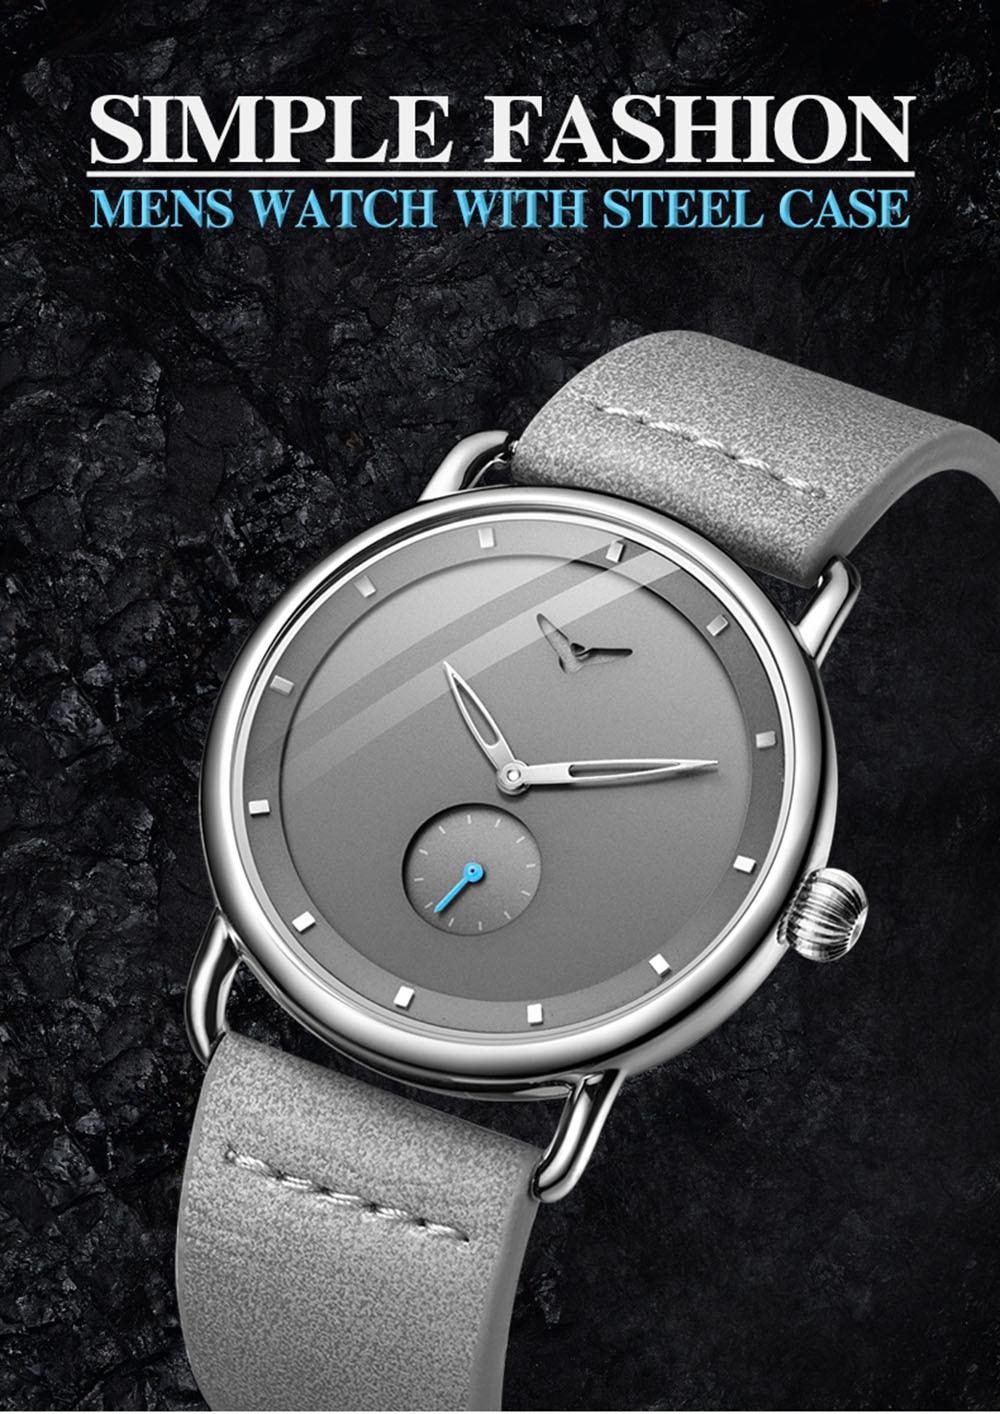 Hd0d7b287e90b46008e1e51dc1e24b19d3 ONOLA top brand leather men watches clock fashion sport simple casual waterproof Wrist watch men relogio masculino